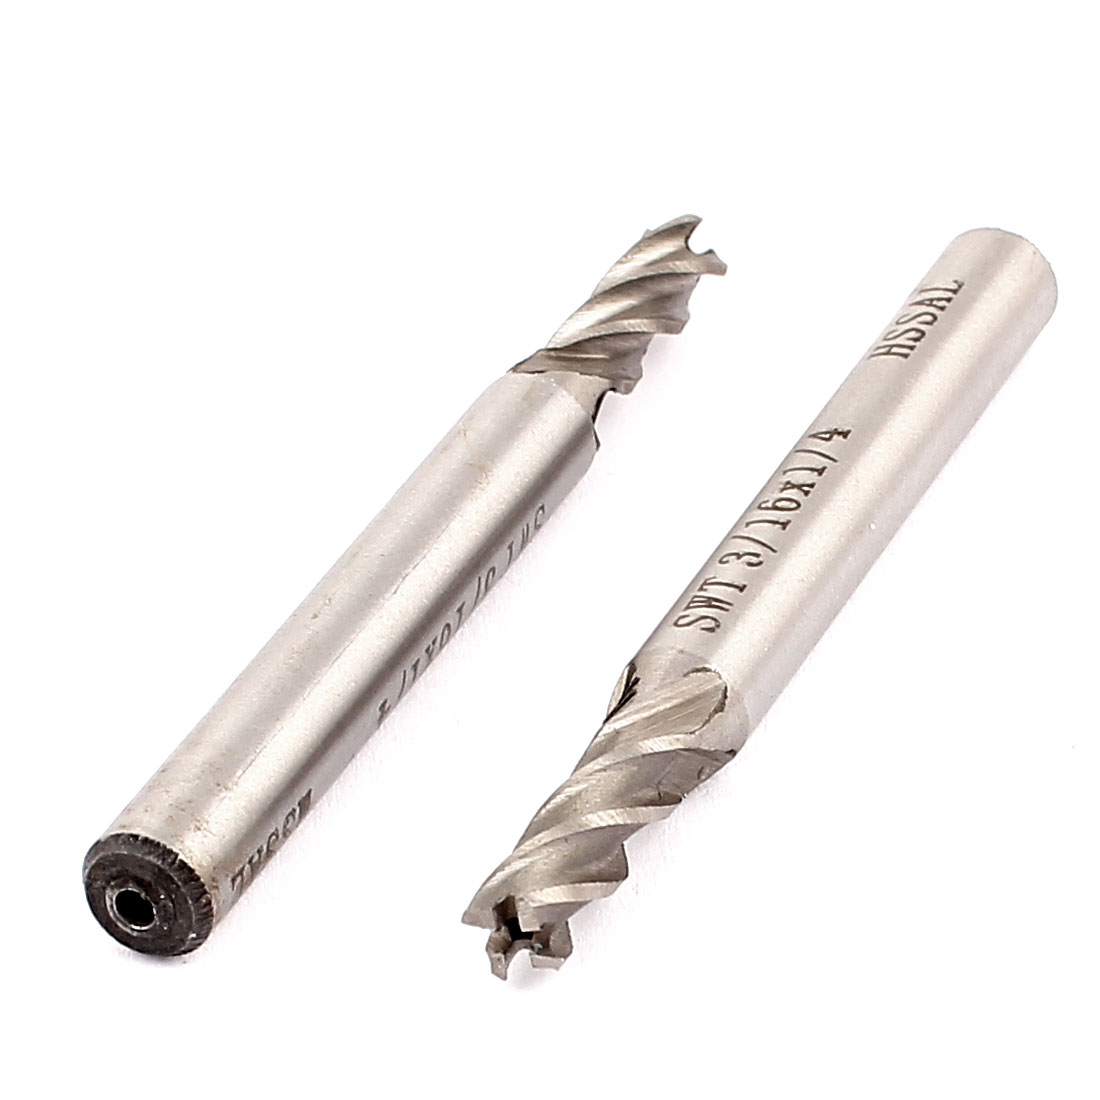 "3/16"" Cutting Dia 4 Flutes HSSAL End Mill Milling Machine Cutter CNC Bit 2Pcs"